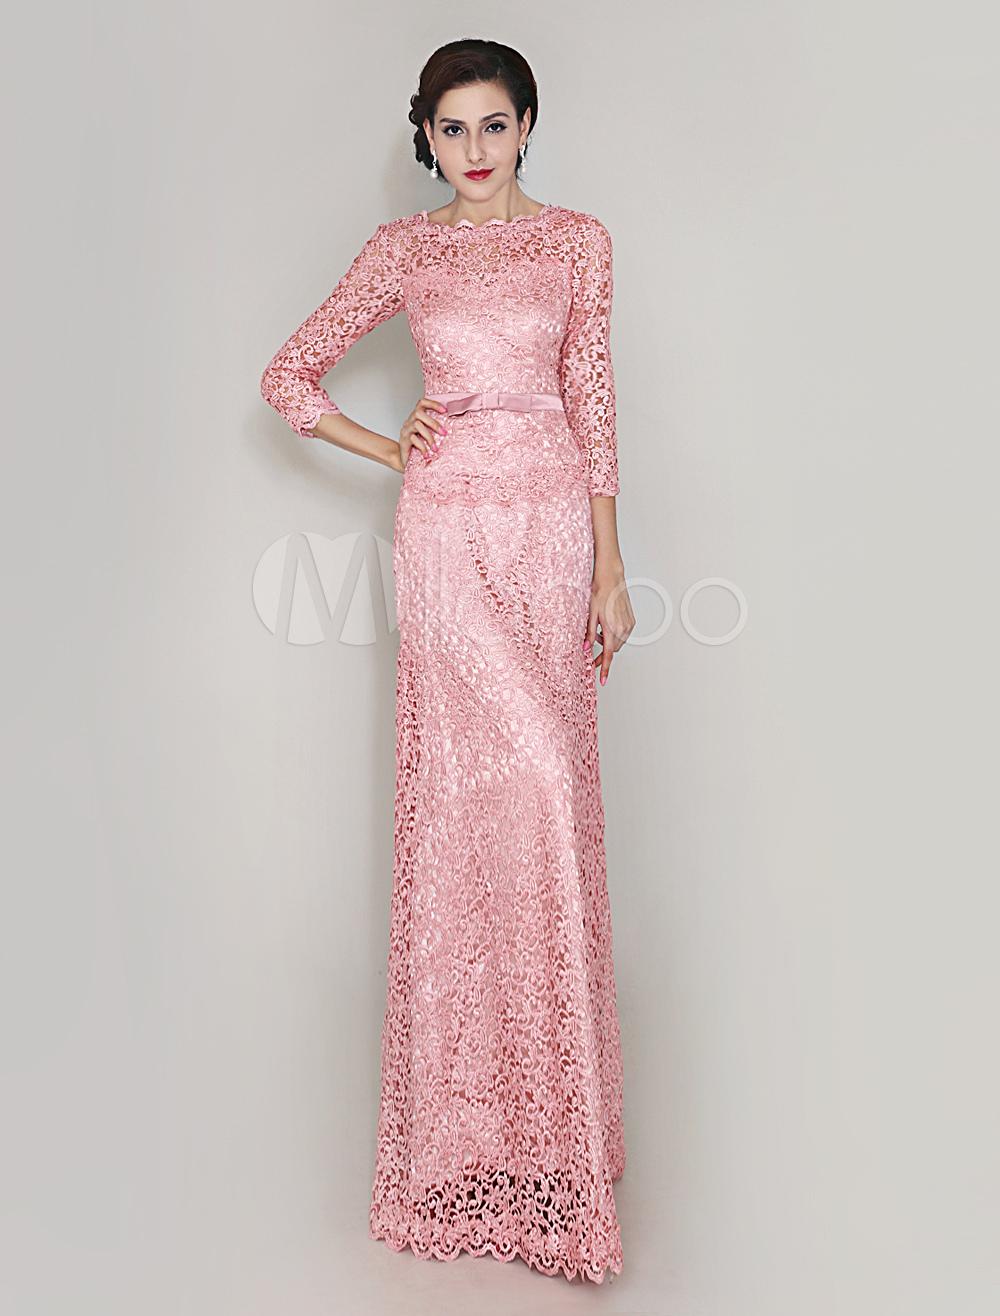 Vestido longo renda guipir rosa